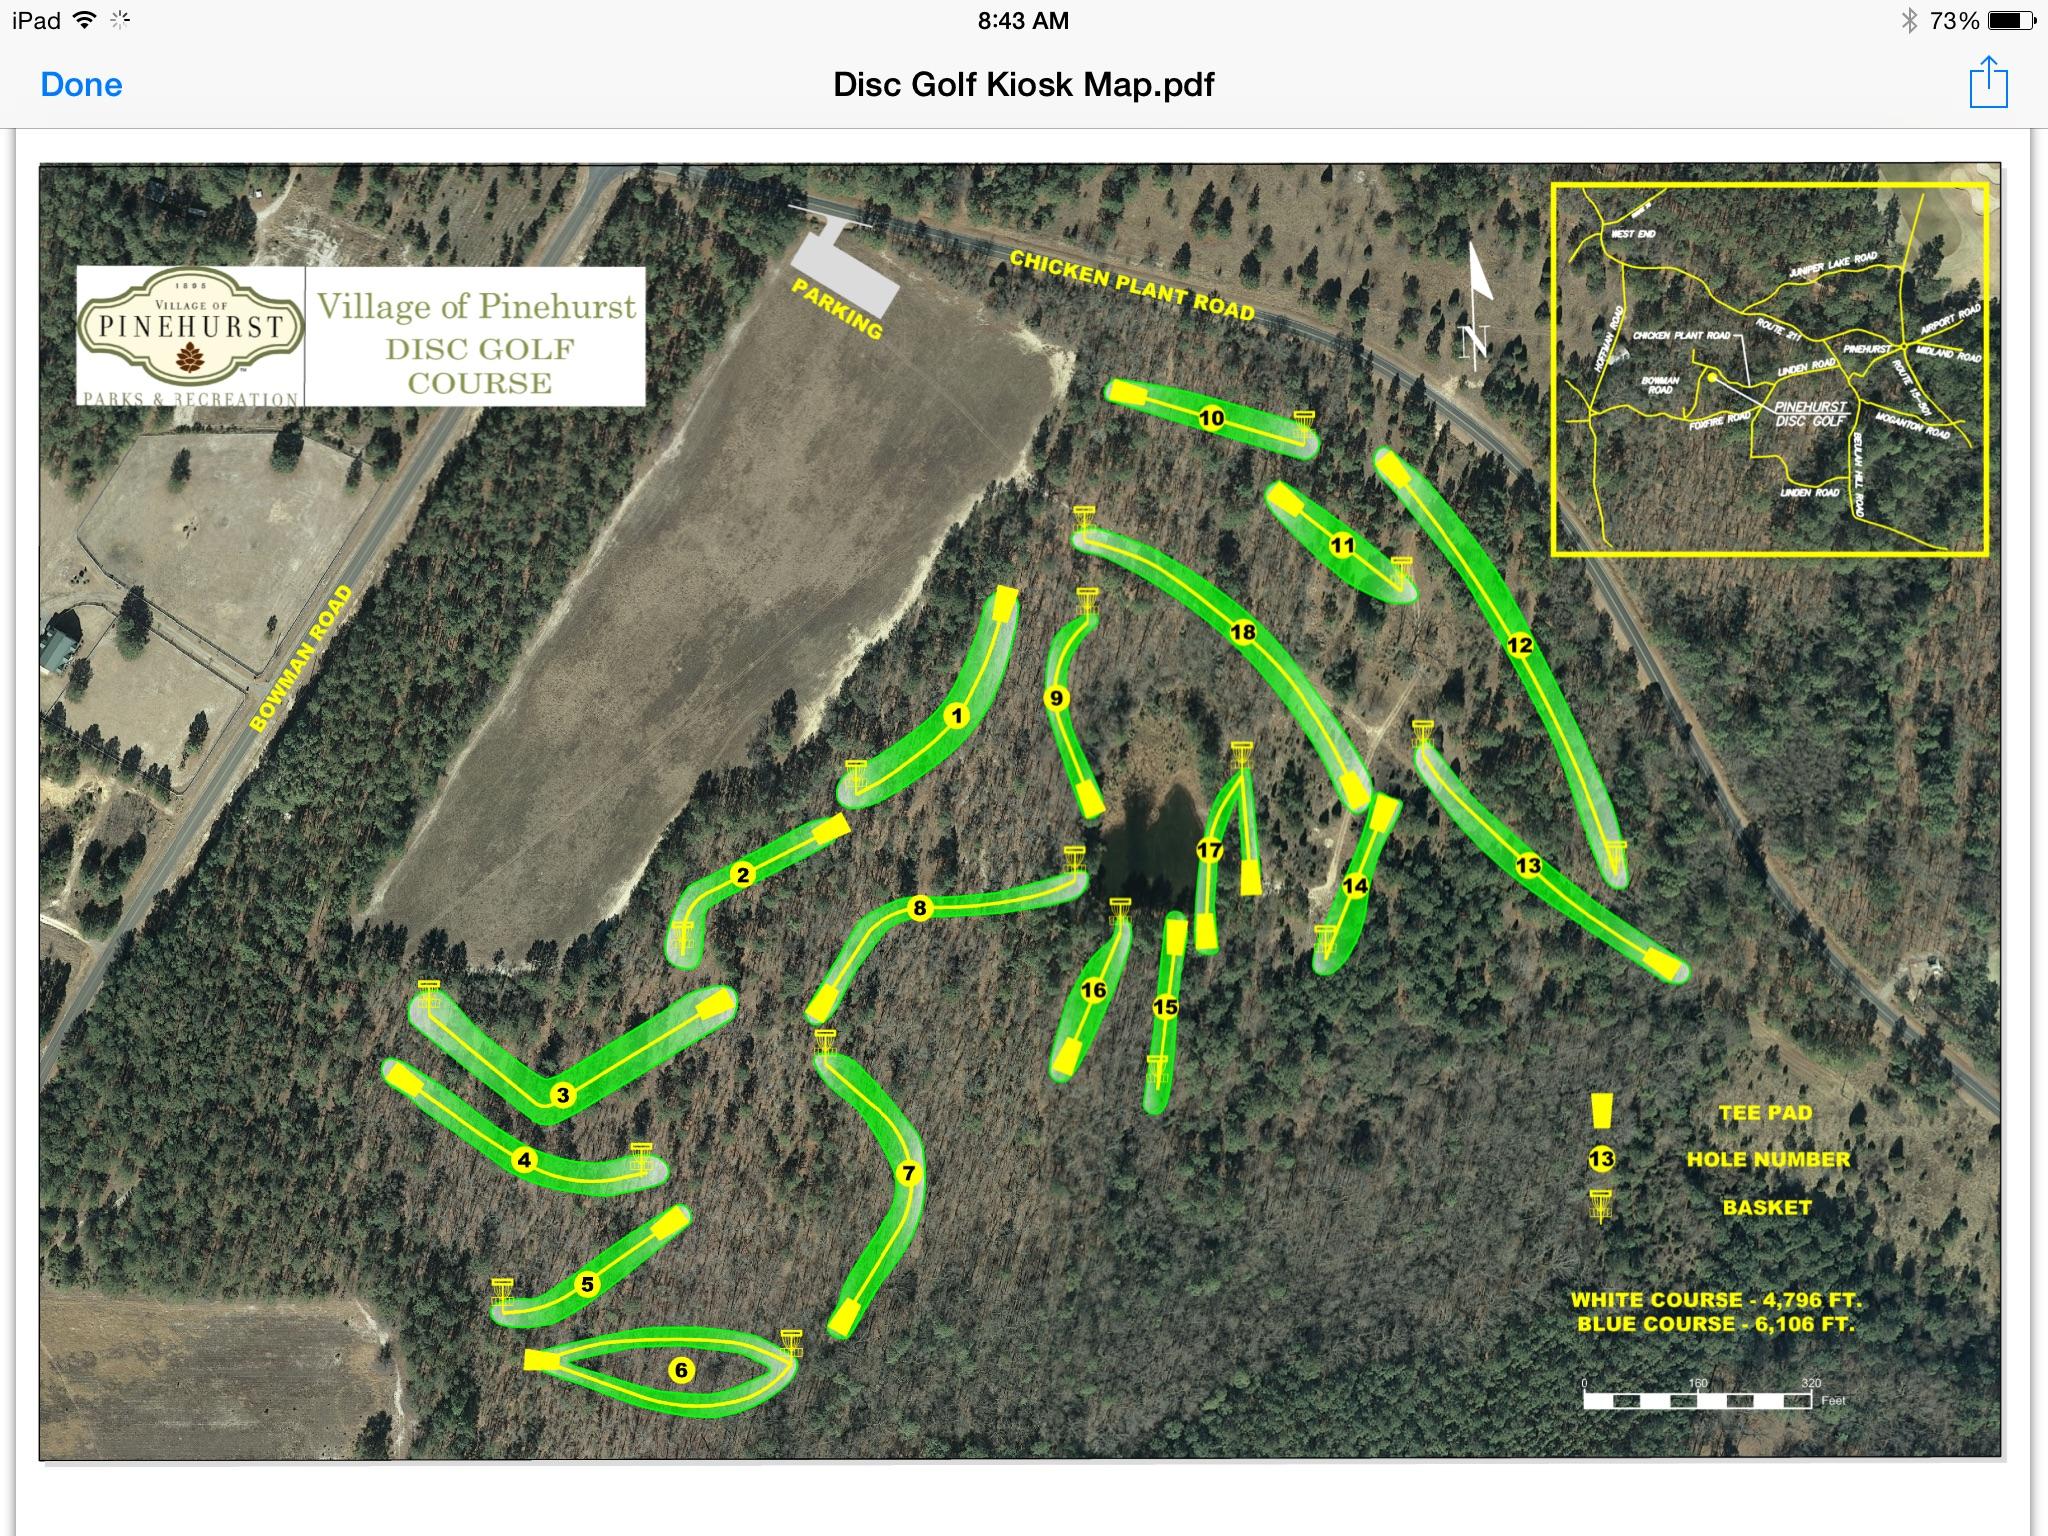 village of pinehurst disc golf course